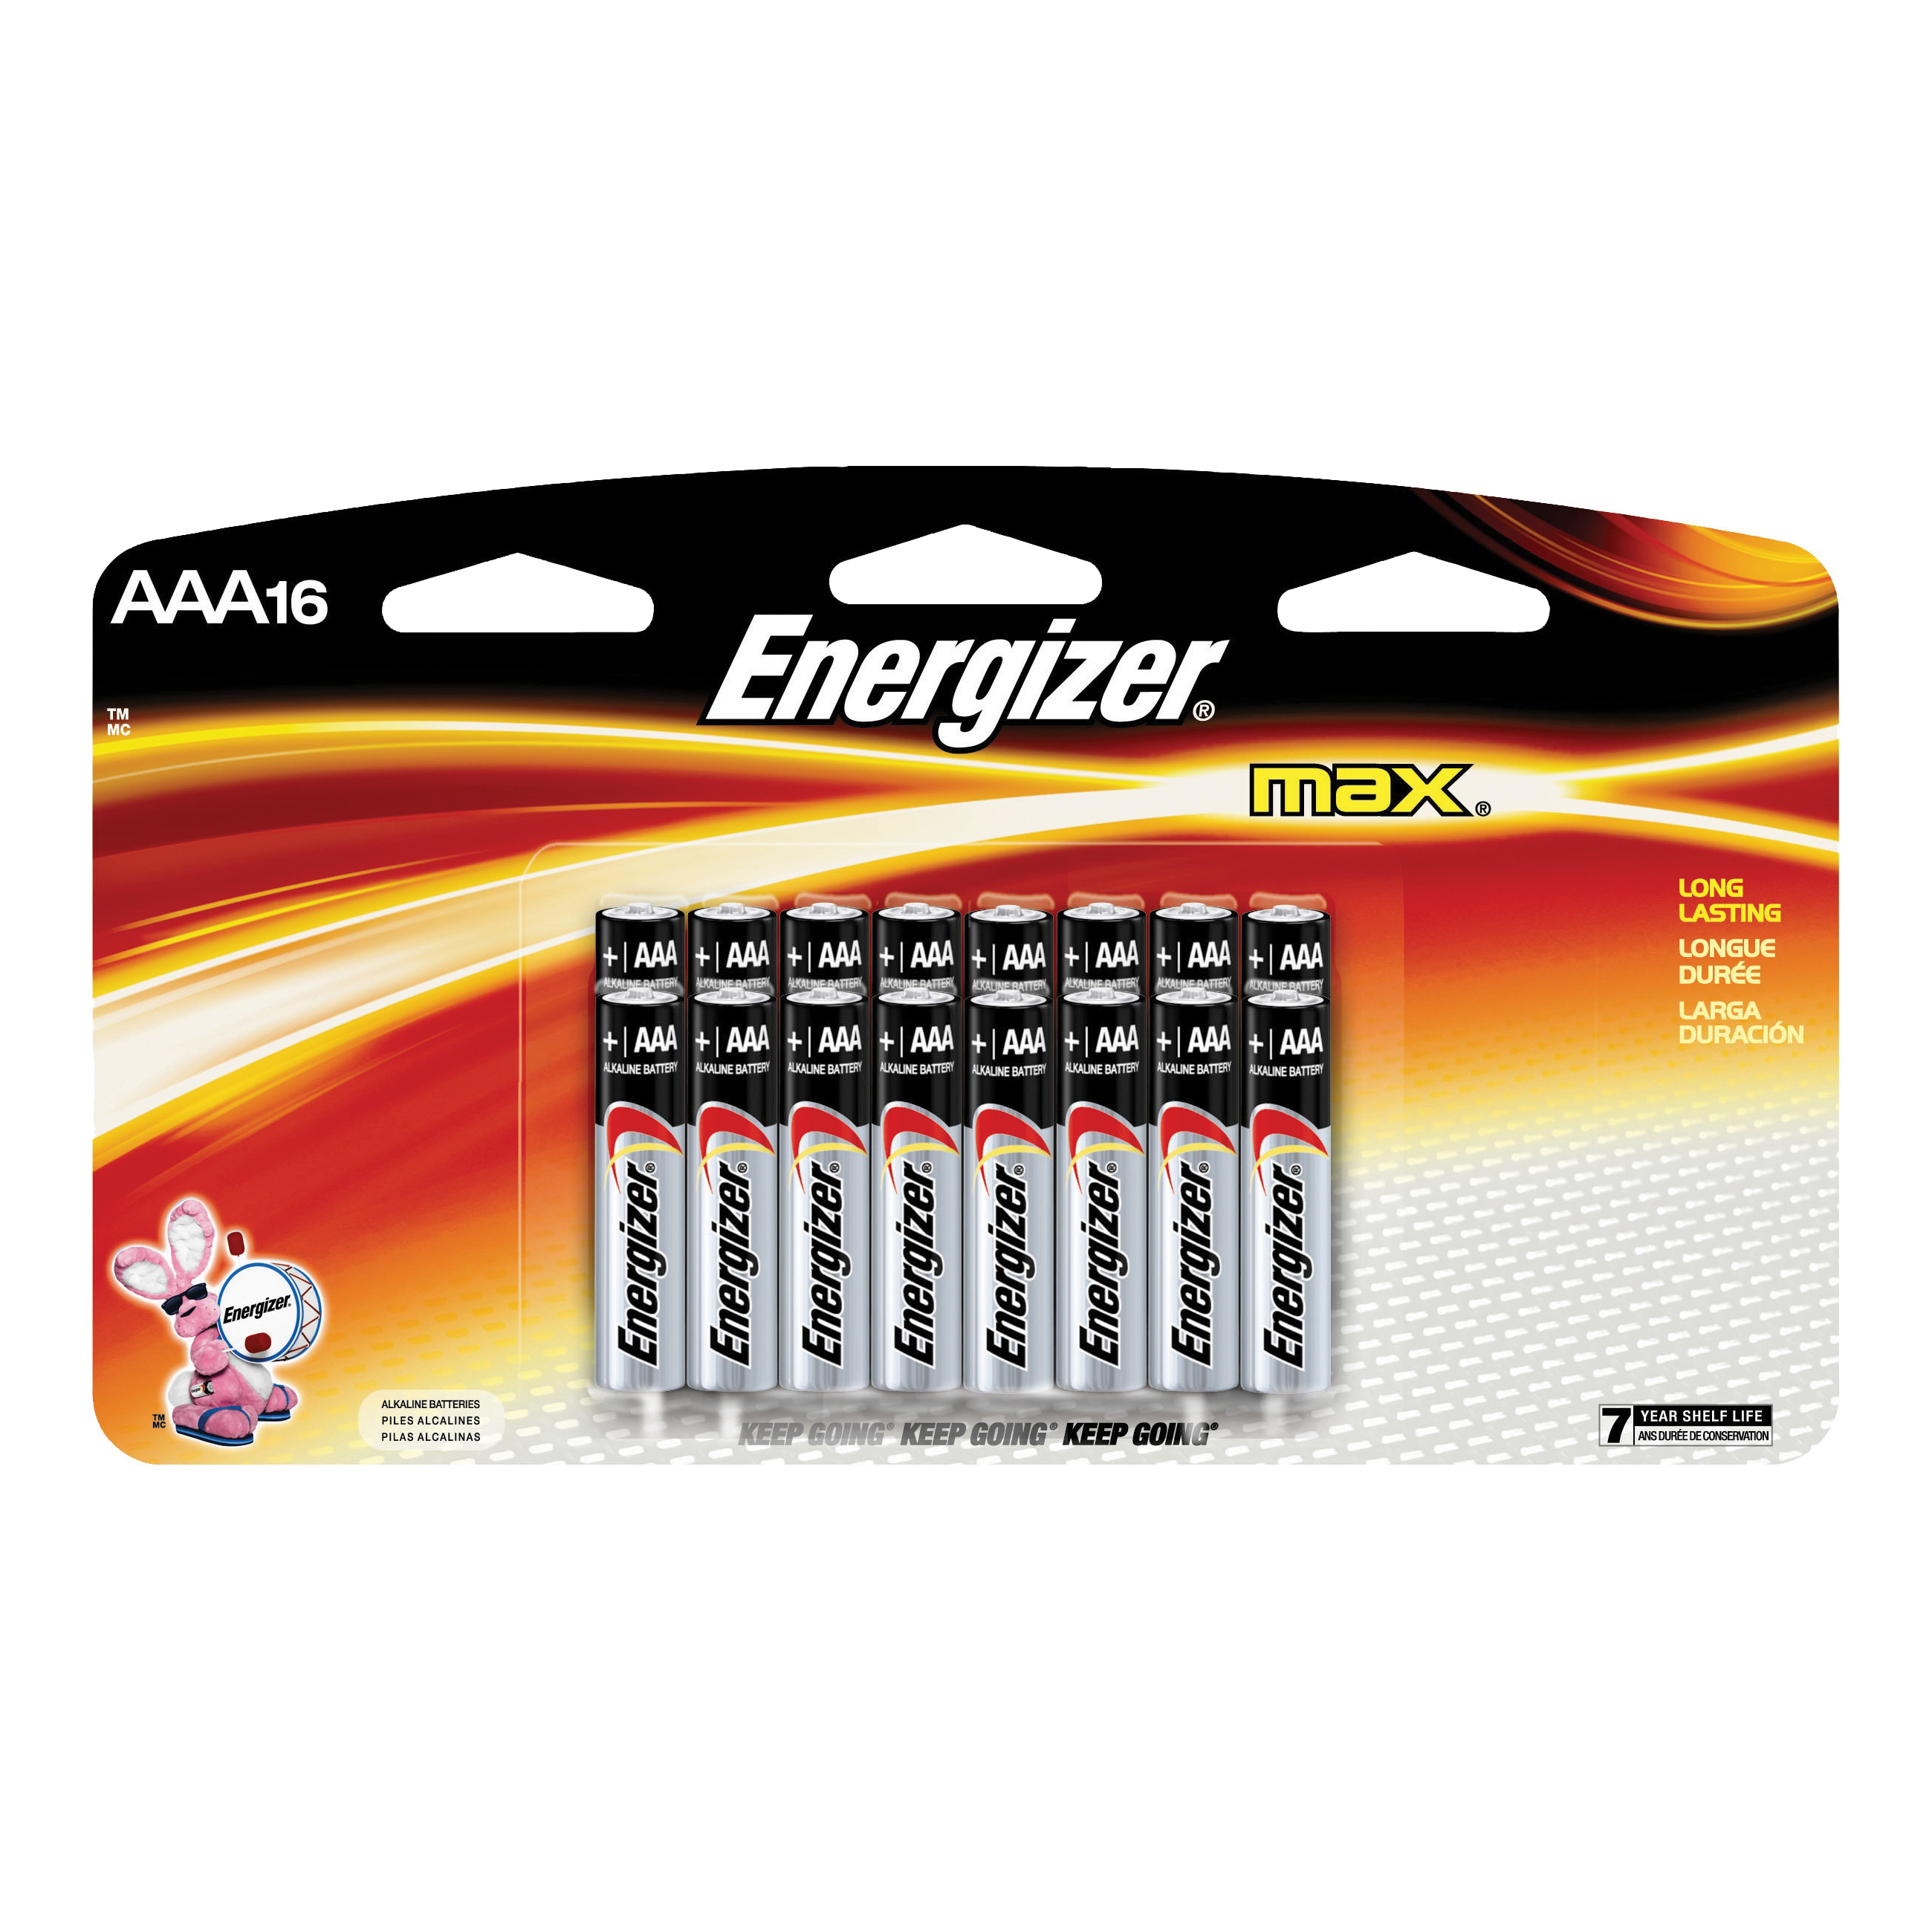 Picture of Energizer E92LP-16 Alkaline Battery, 1.5 V Battery, 1250 mAh, AAA Battery, Zinc, Manganese Dioxide, 16/PK